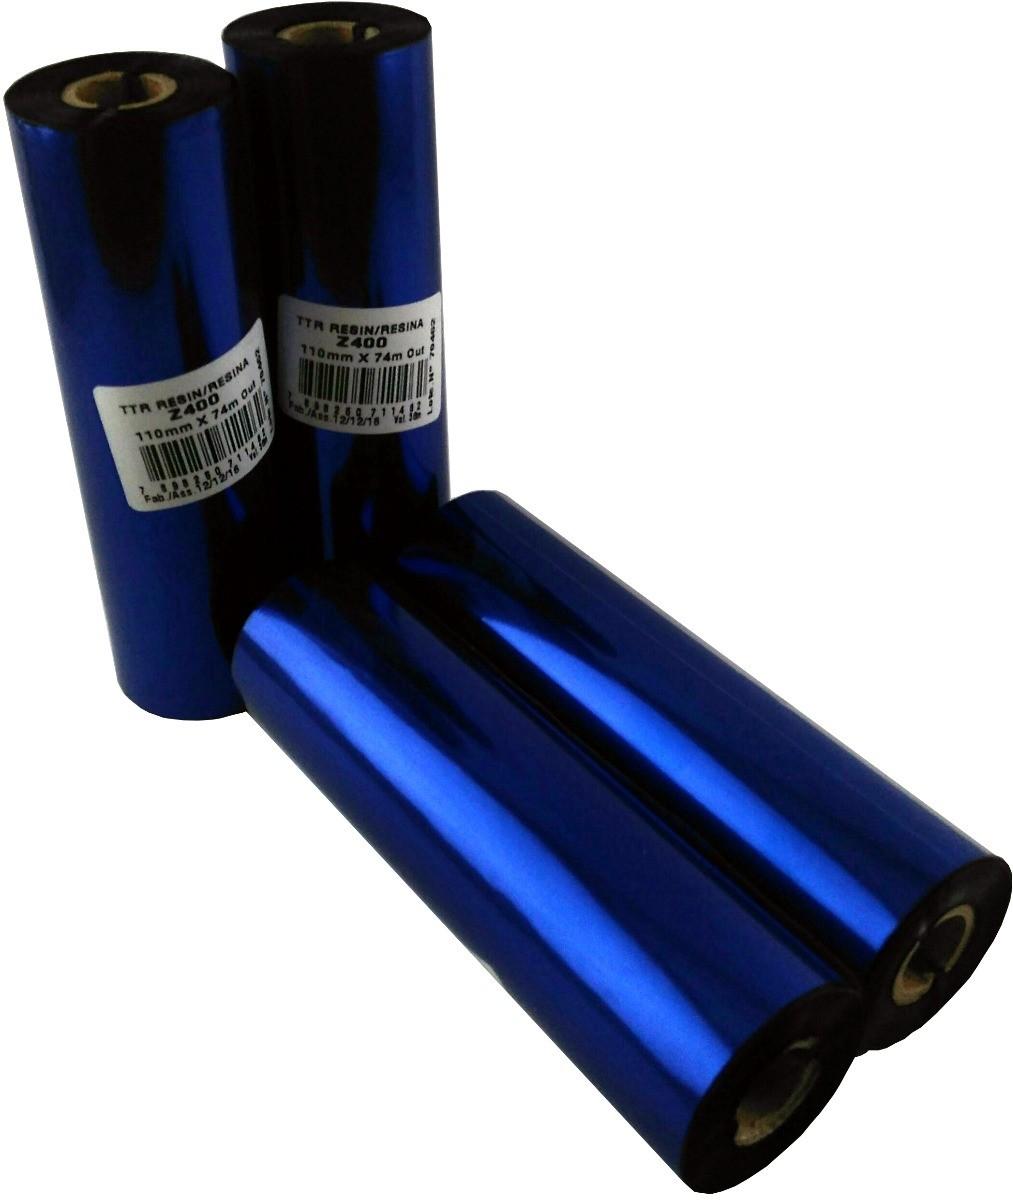 24 Rolos | Ribbon Resina Z400 110X74